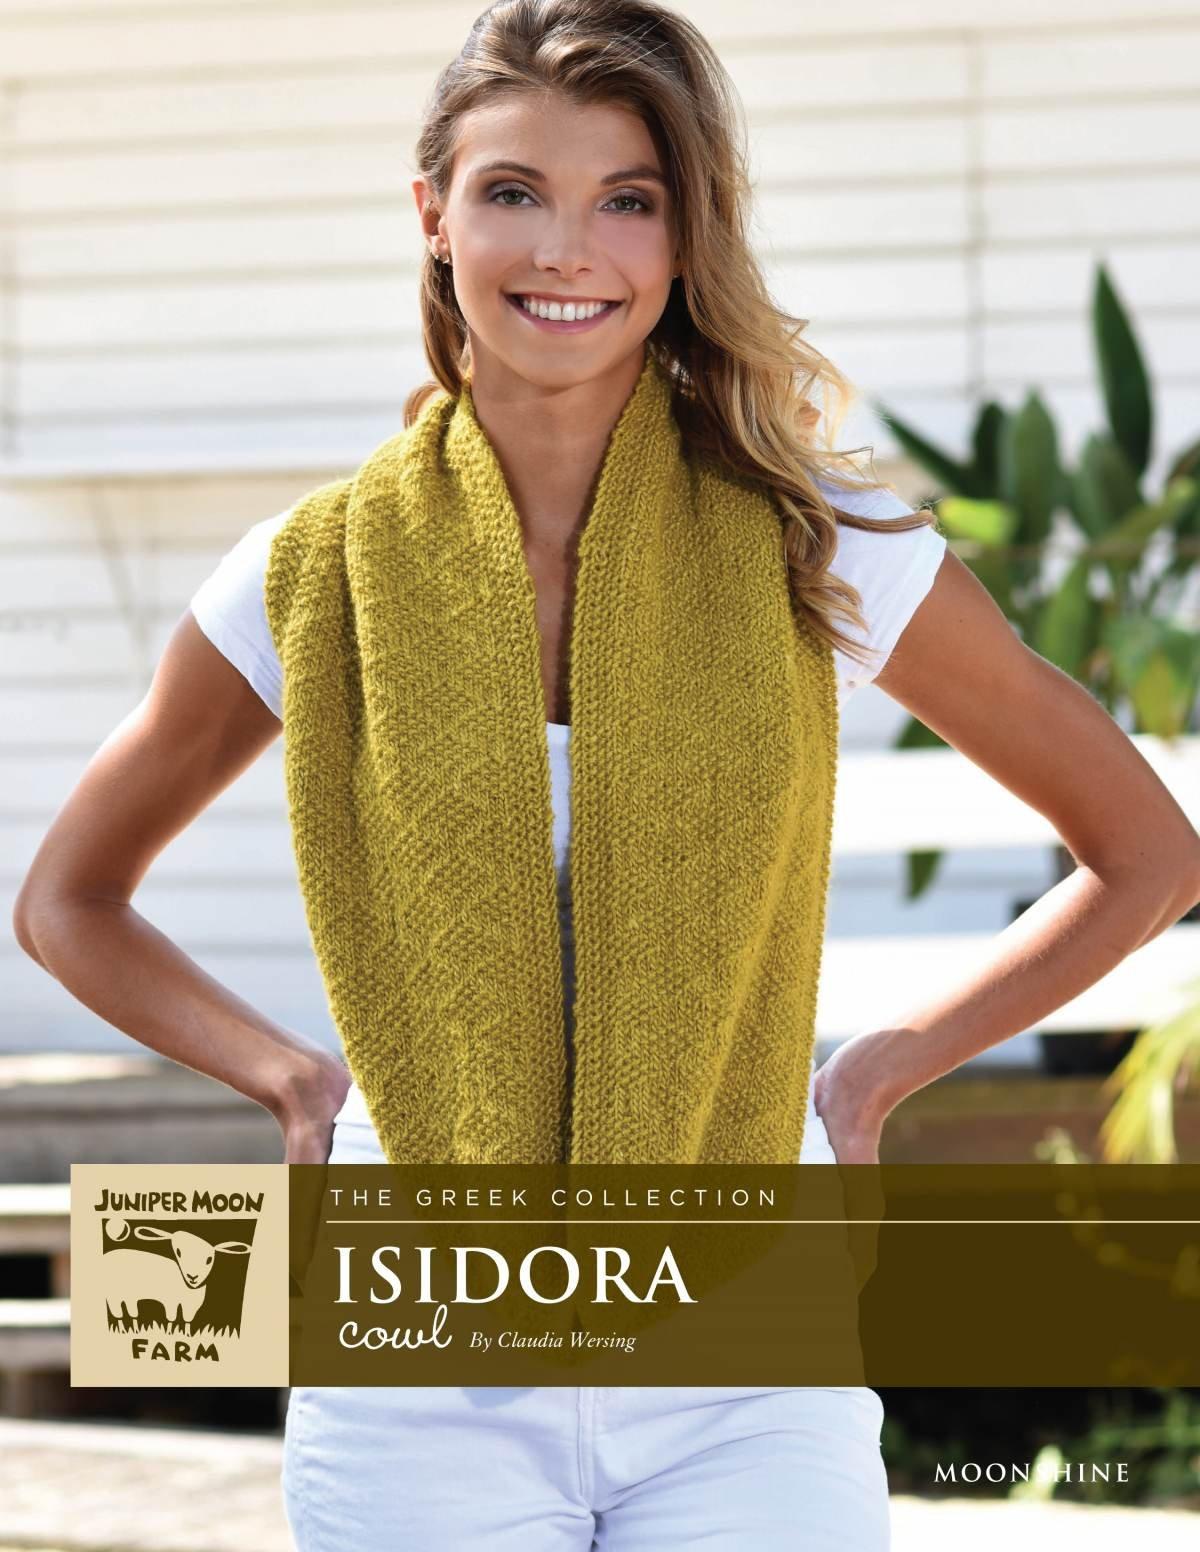 Isidora Cowl pattern